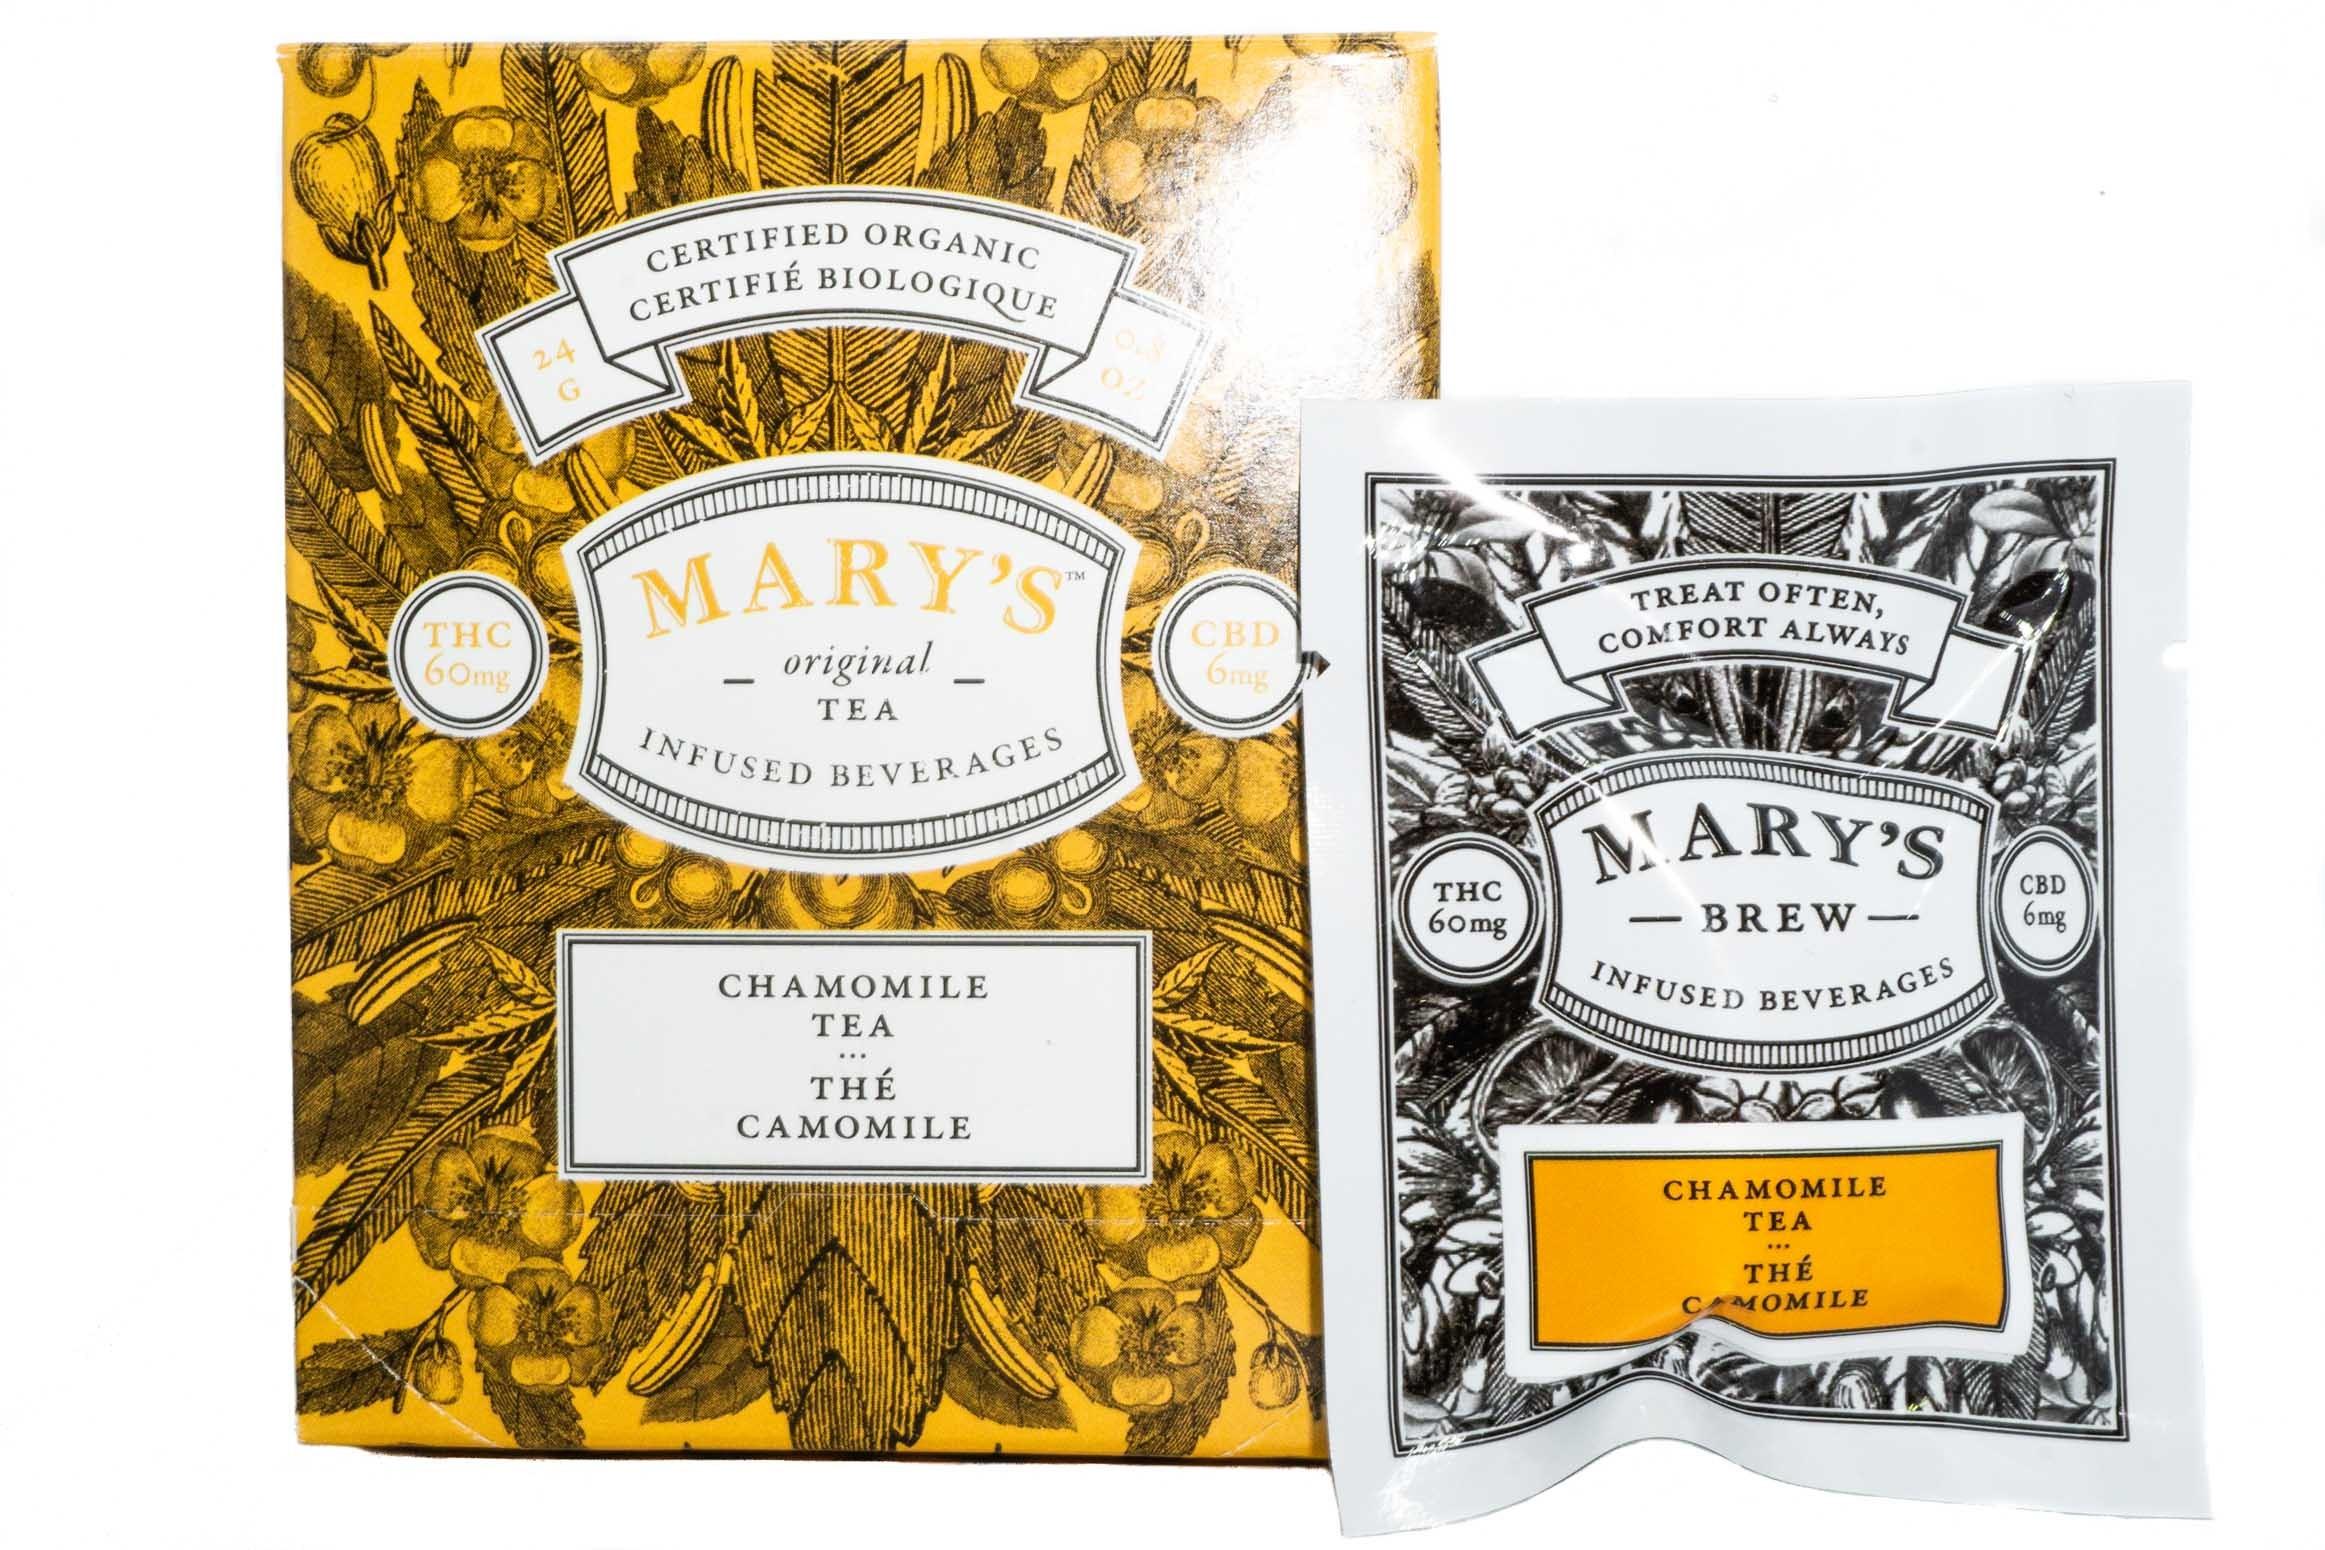 Mary's Wellness Chamomile Tea (Single Sachet) (60mg THC/6mg CBD) 01239